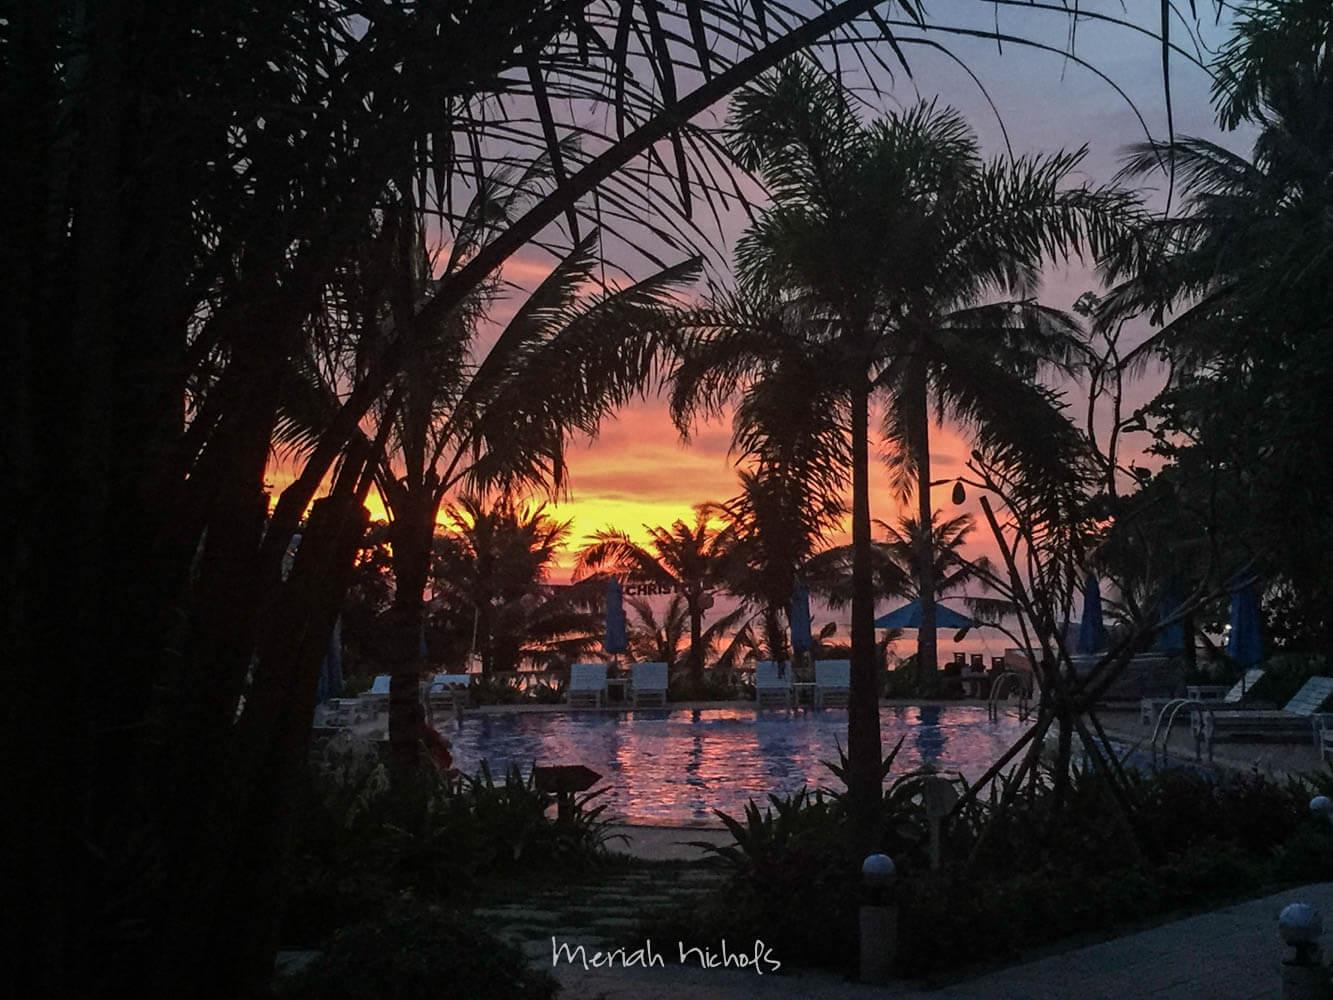 Meriah Nichols Phu Quoc Island Vietnam-3-2